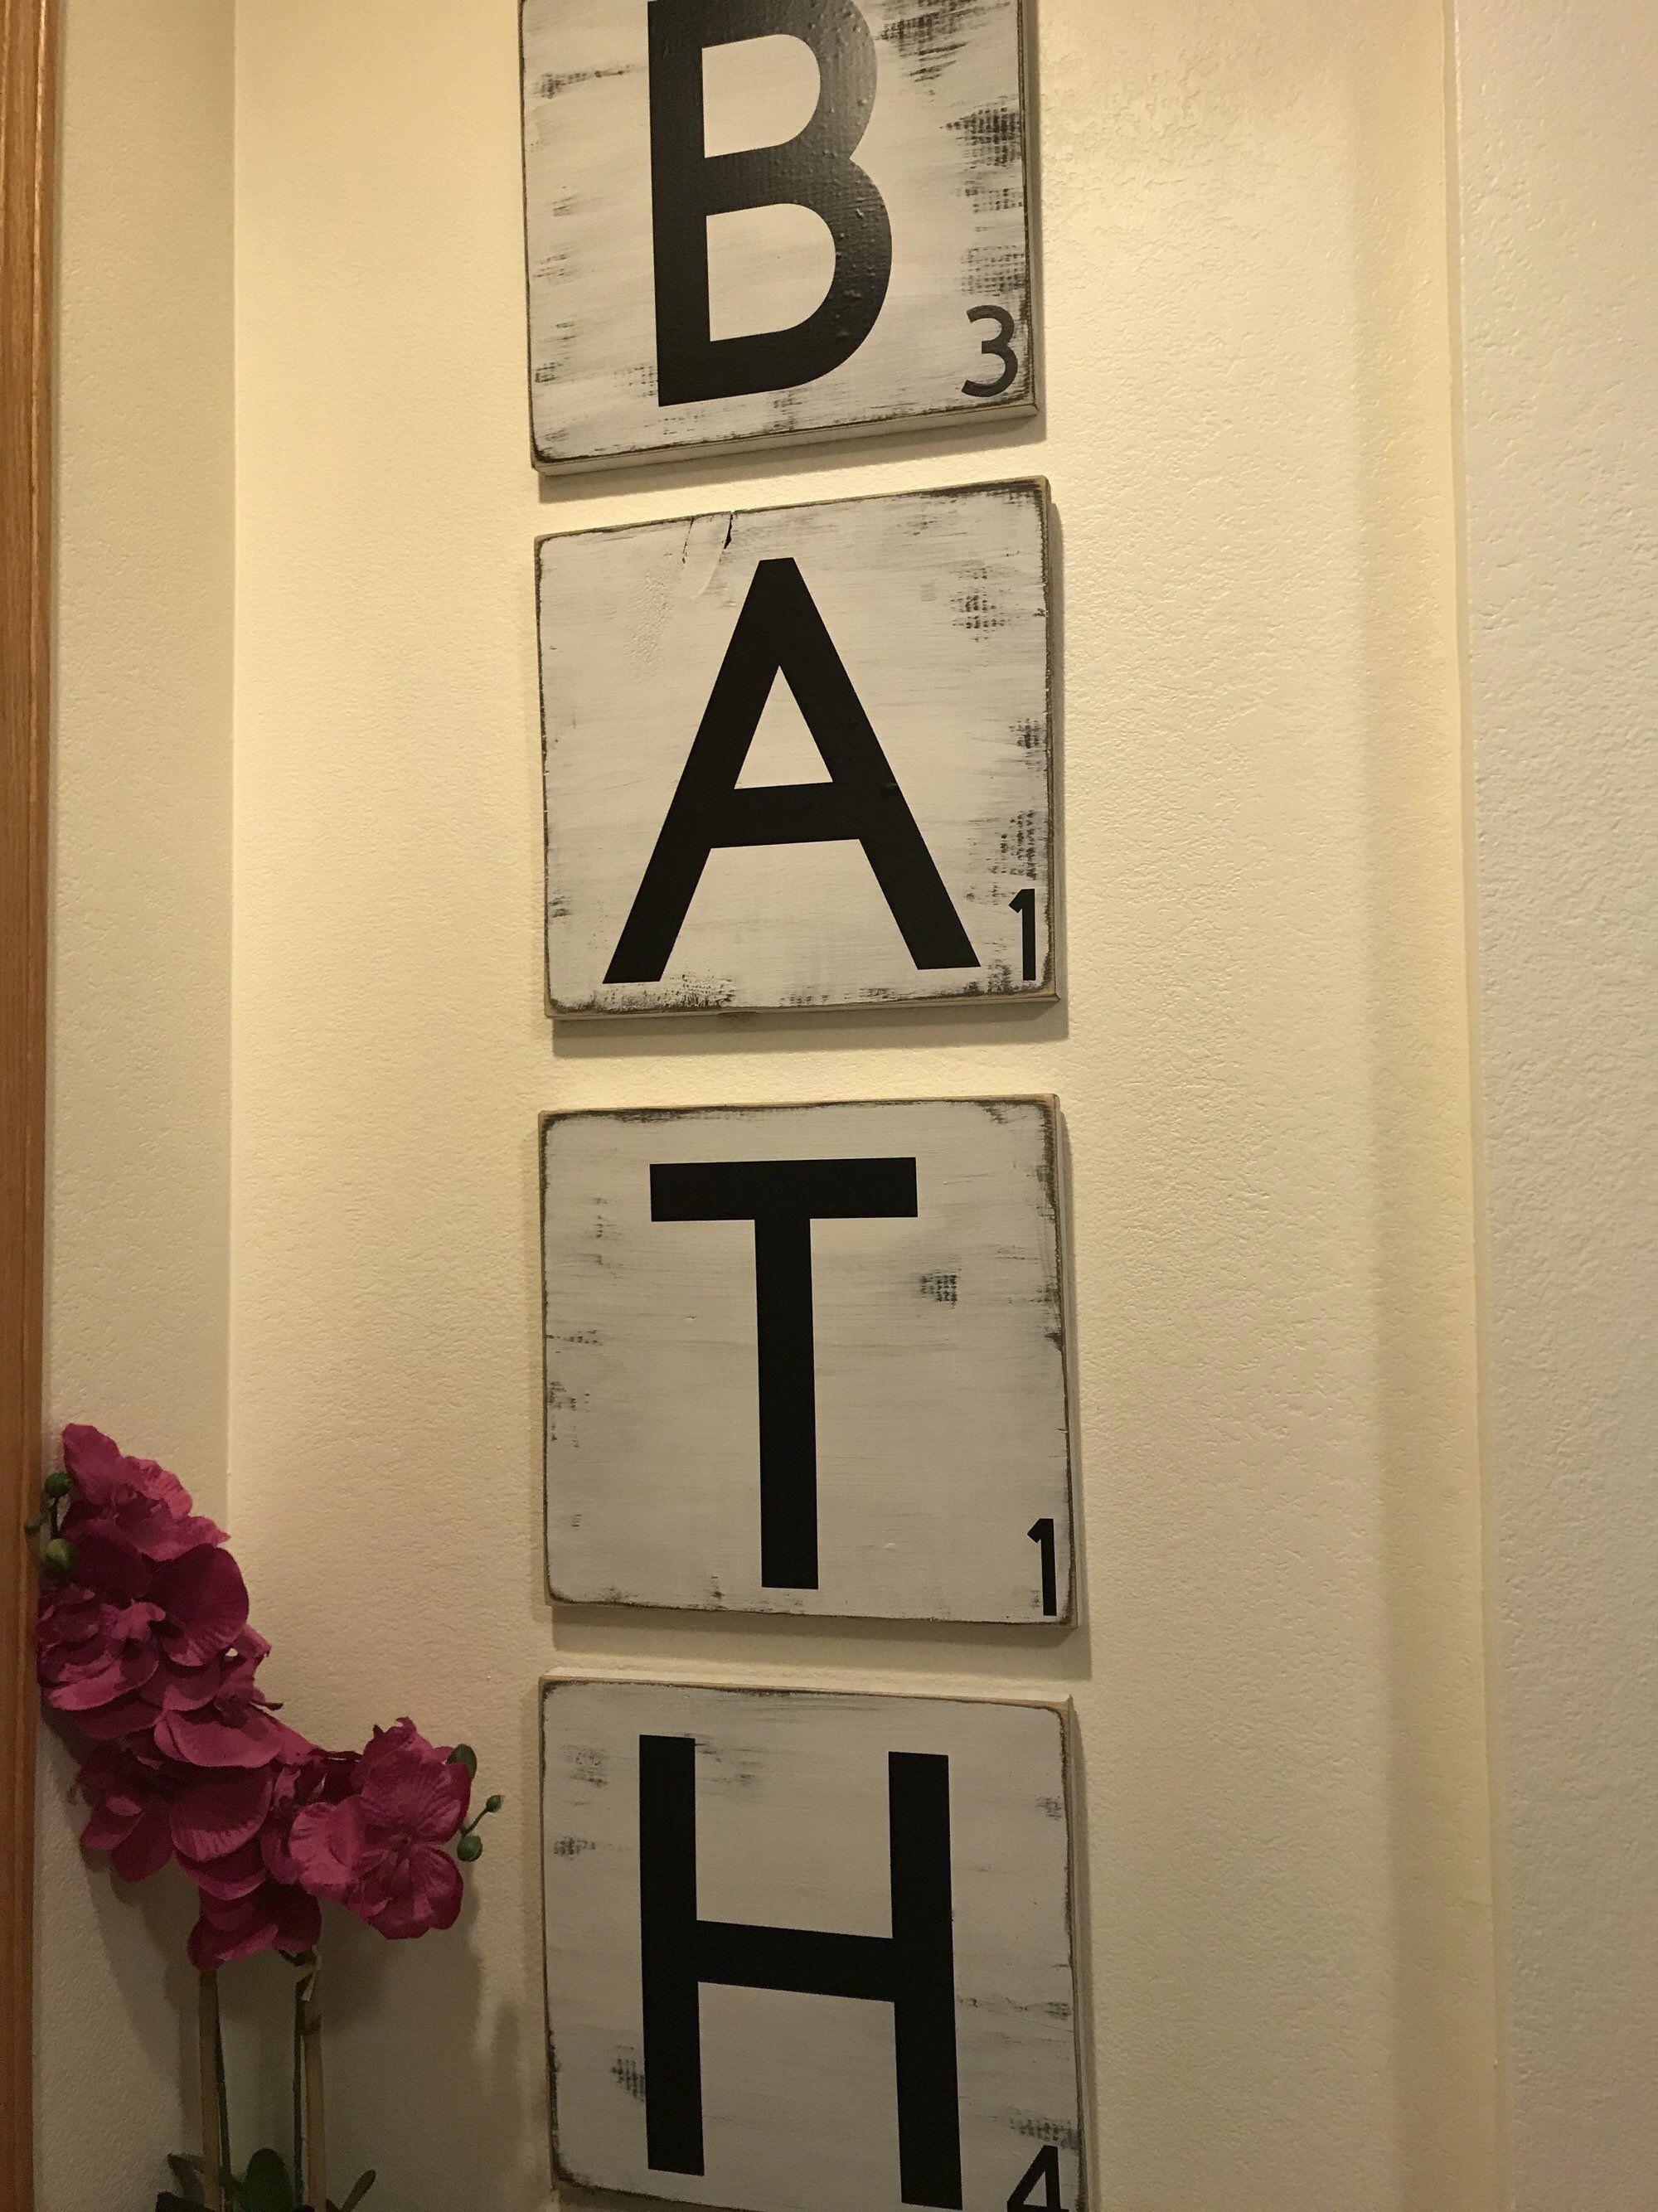 Large bath sign, 48 inch sign, large bathroom sign, bathroom wall decor, potty sign, restroom sign, farmhouse bathroom sign, large scrabble